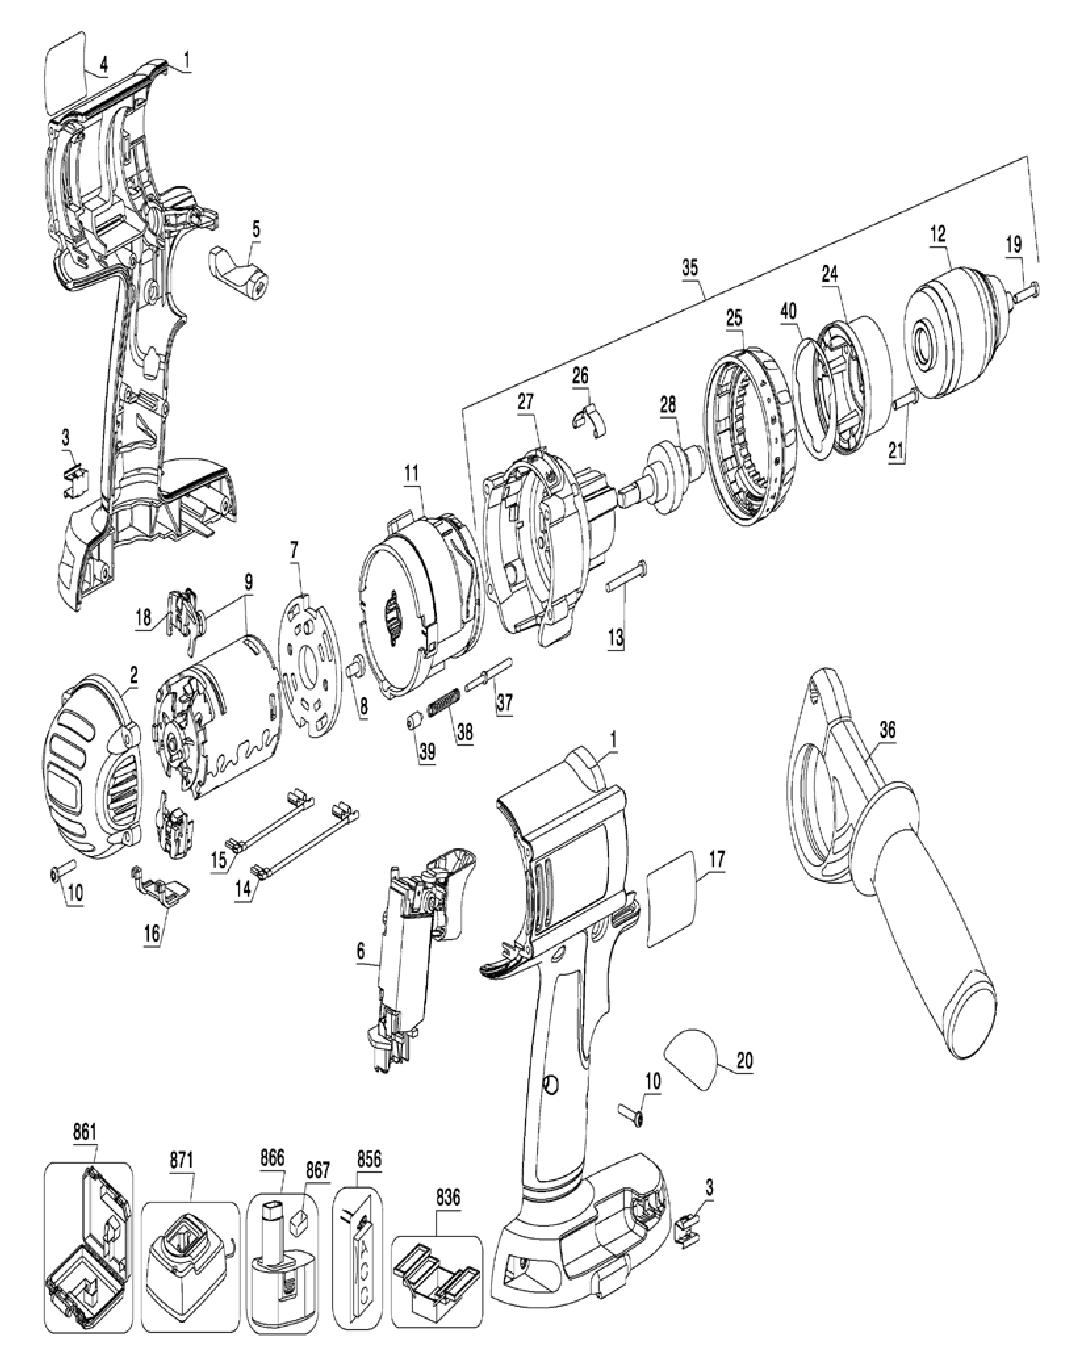 Dewalt Dc920ka Parts List